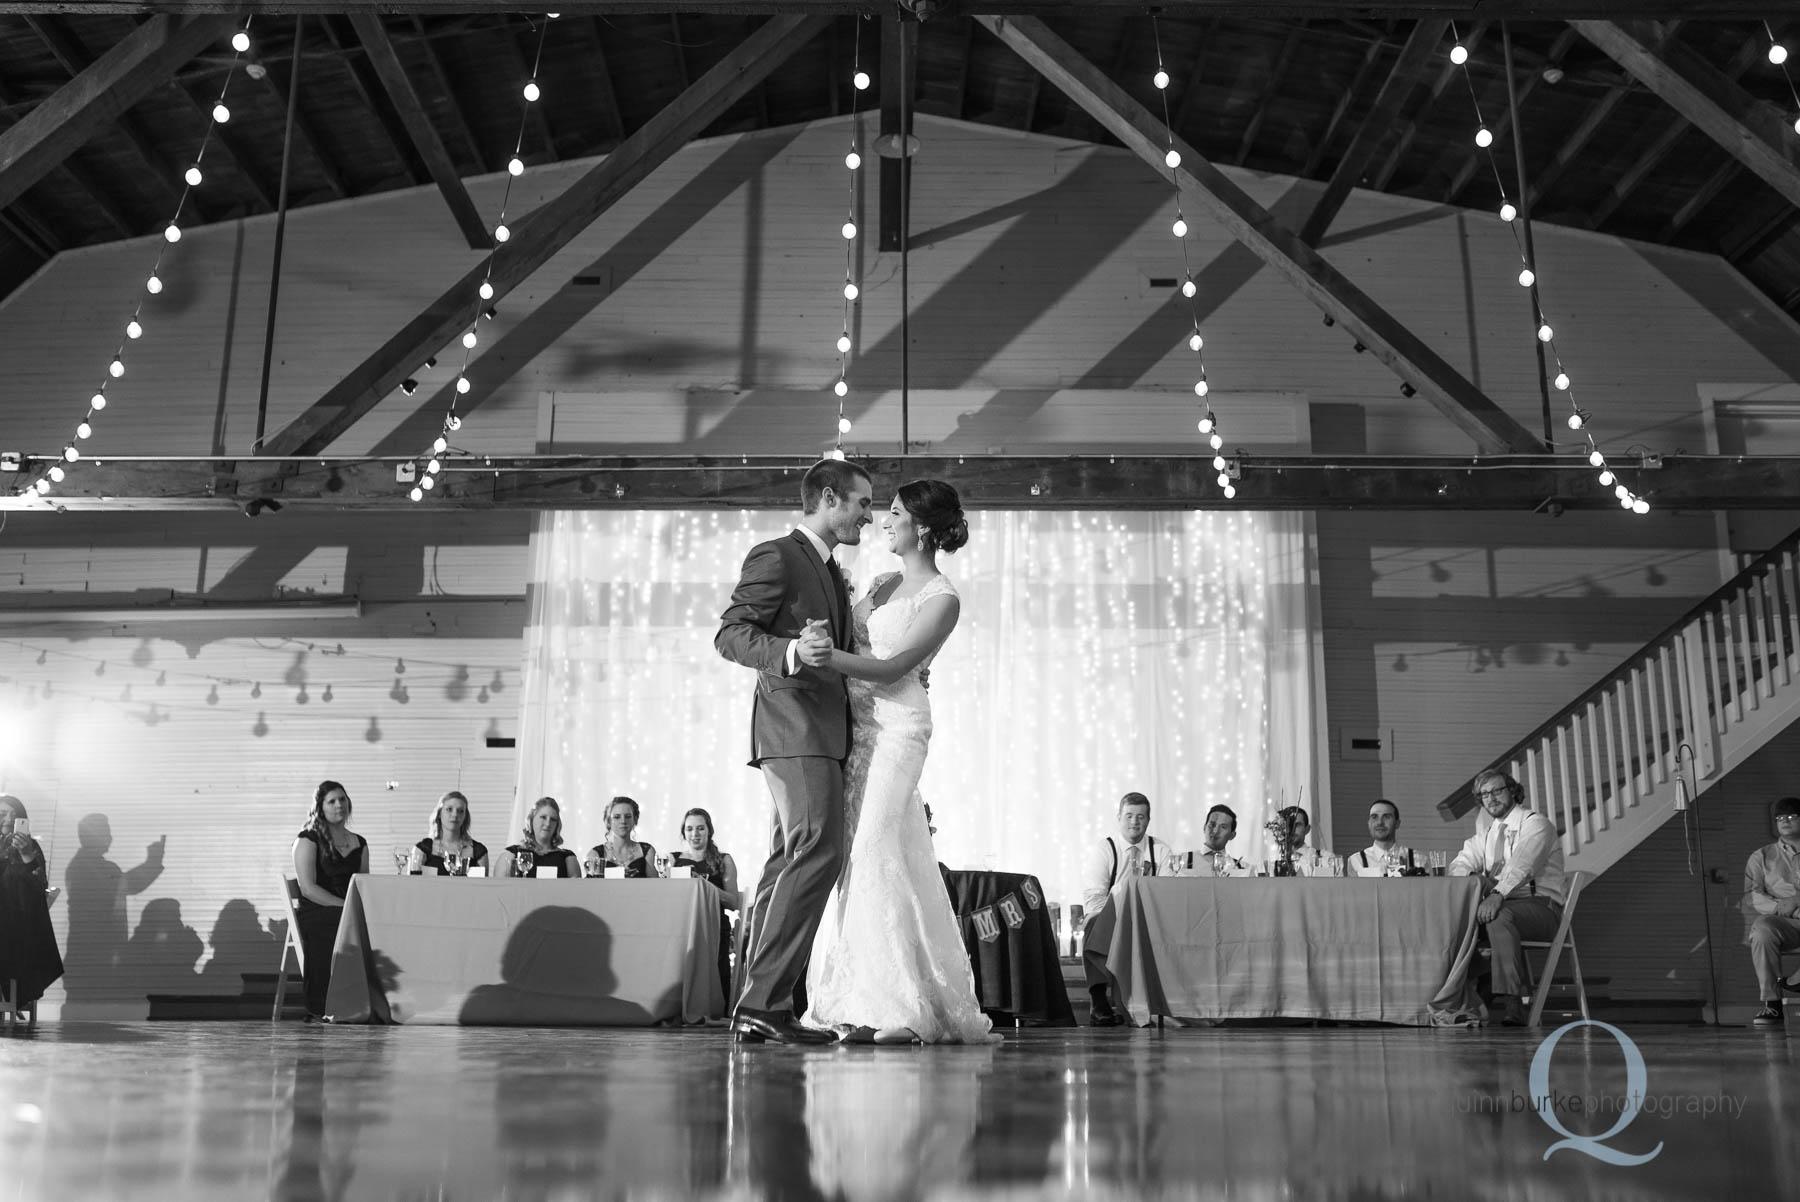 bride and groom first dance in barn at Green Villa Barn wedding